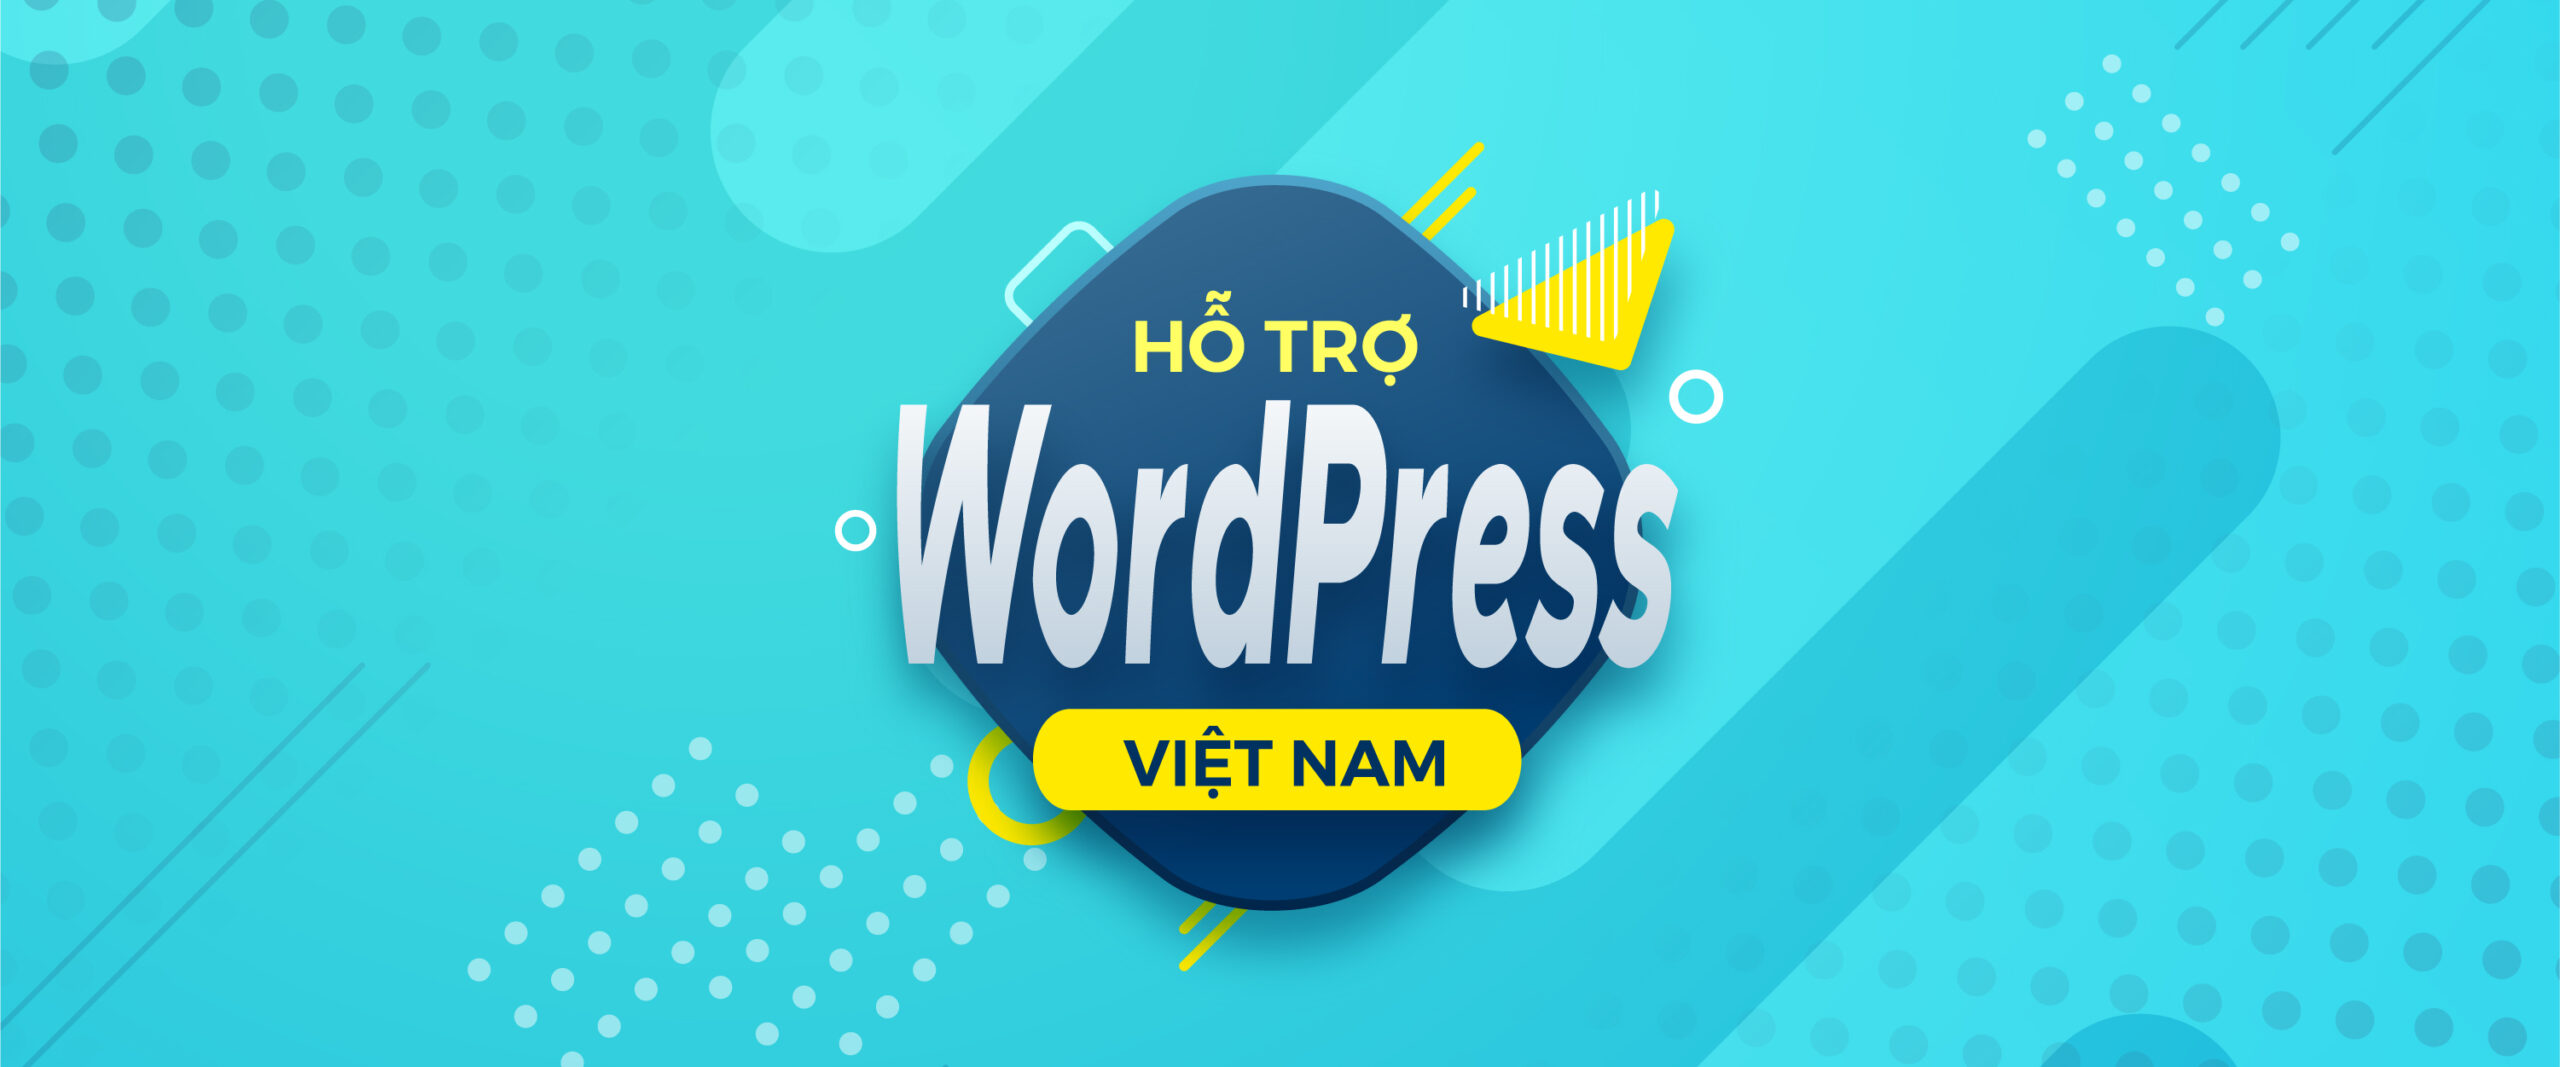 hỗ trợ WordPress